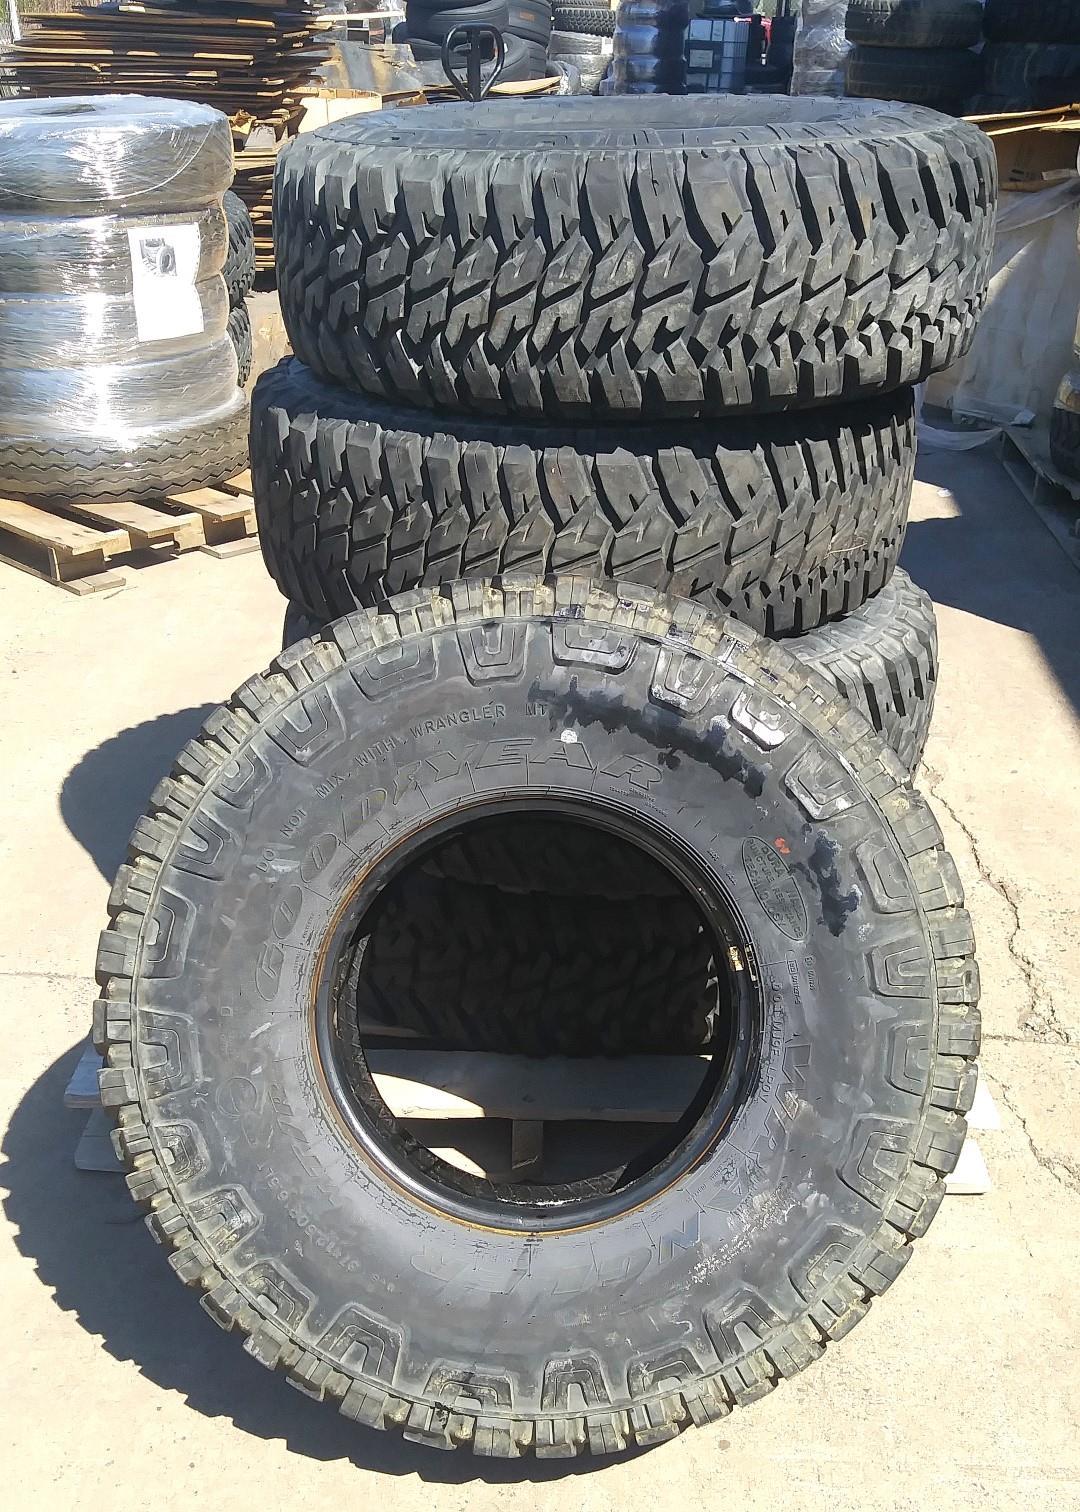 Goodyear Wrangler MT/R 37x12 50R16 5LT Tire (5 Tire Lot Sale)